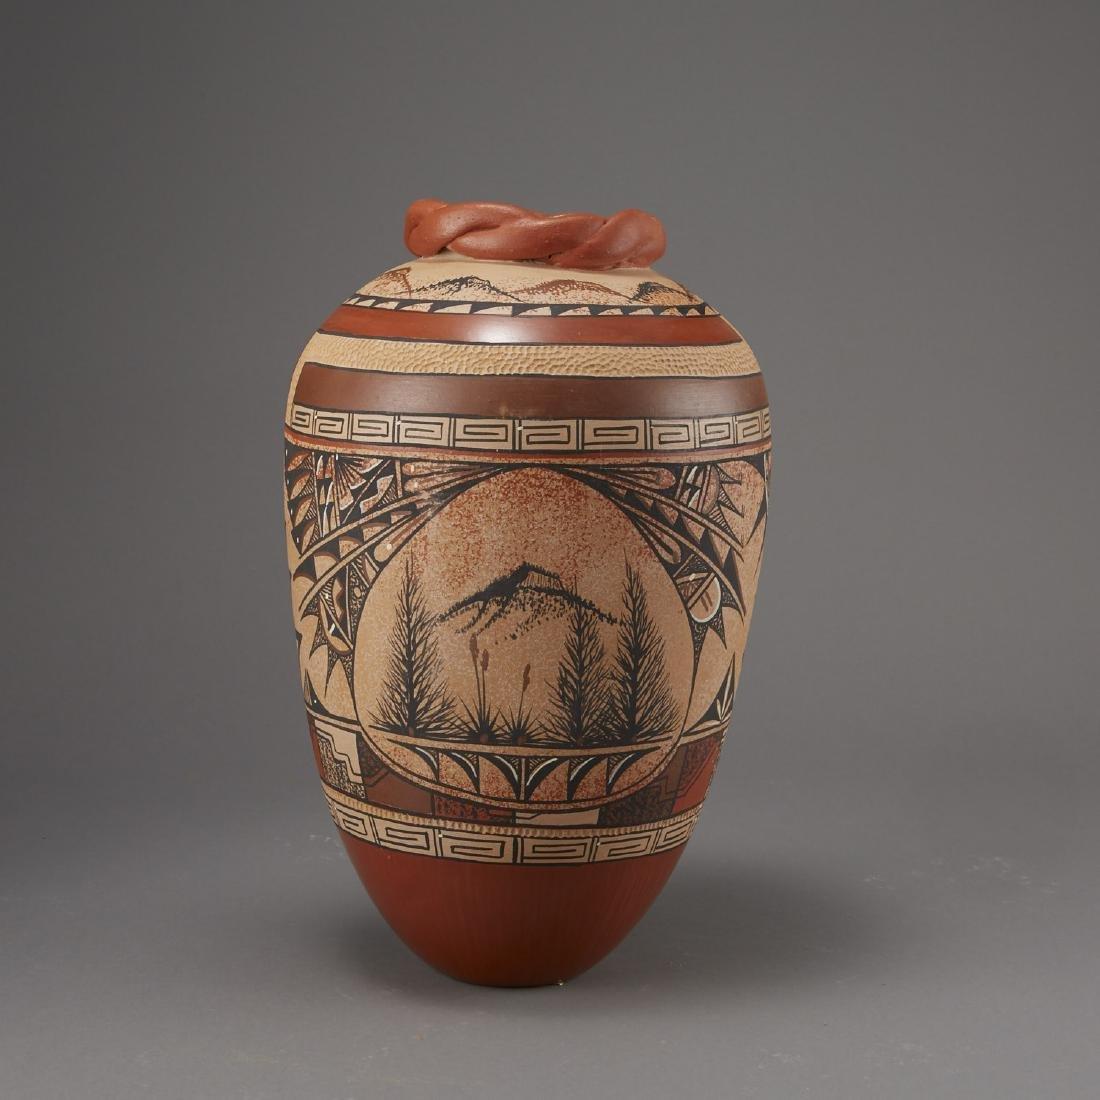 6 Pueblo Pottery Pots incld Fragua, Nez, Medina - 9